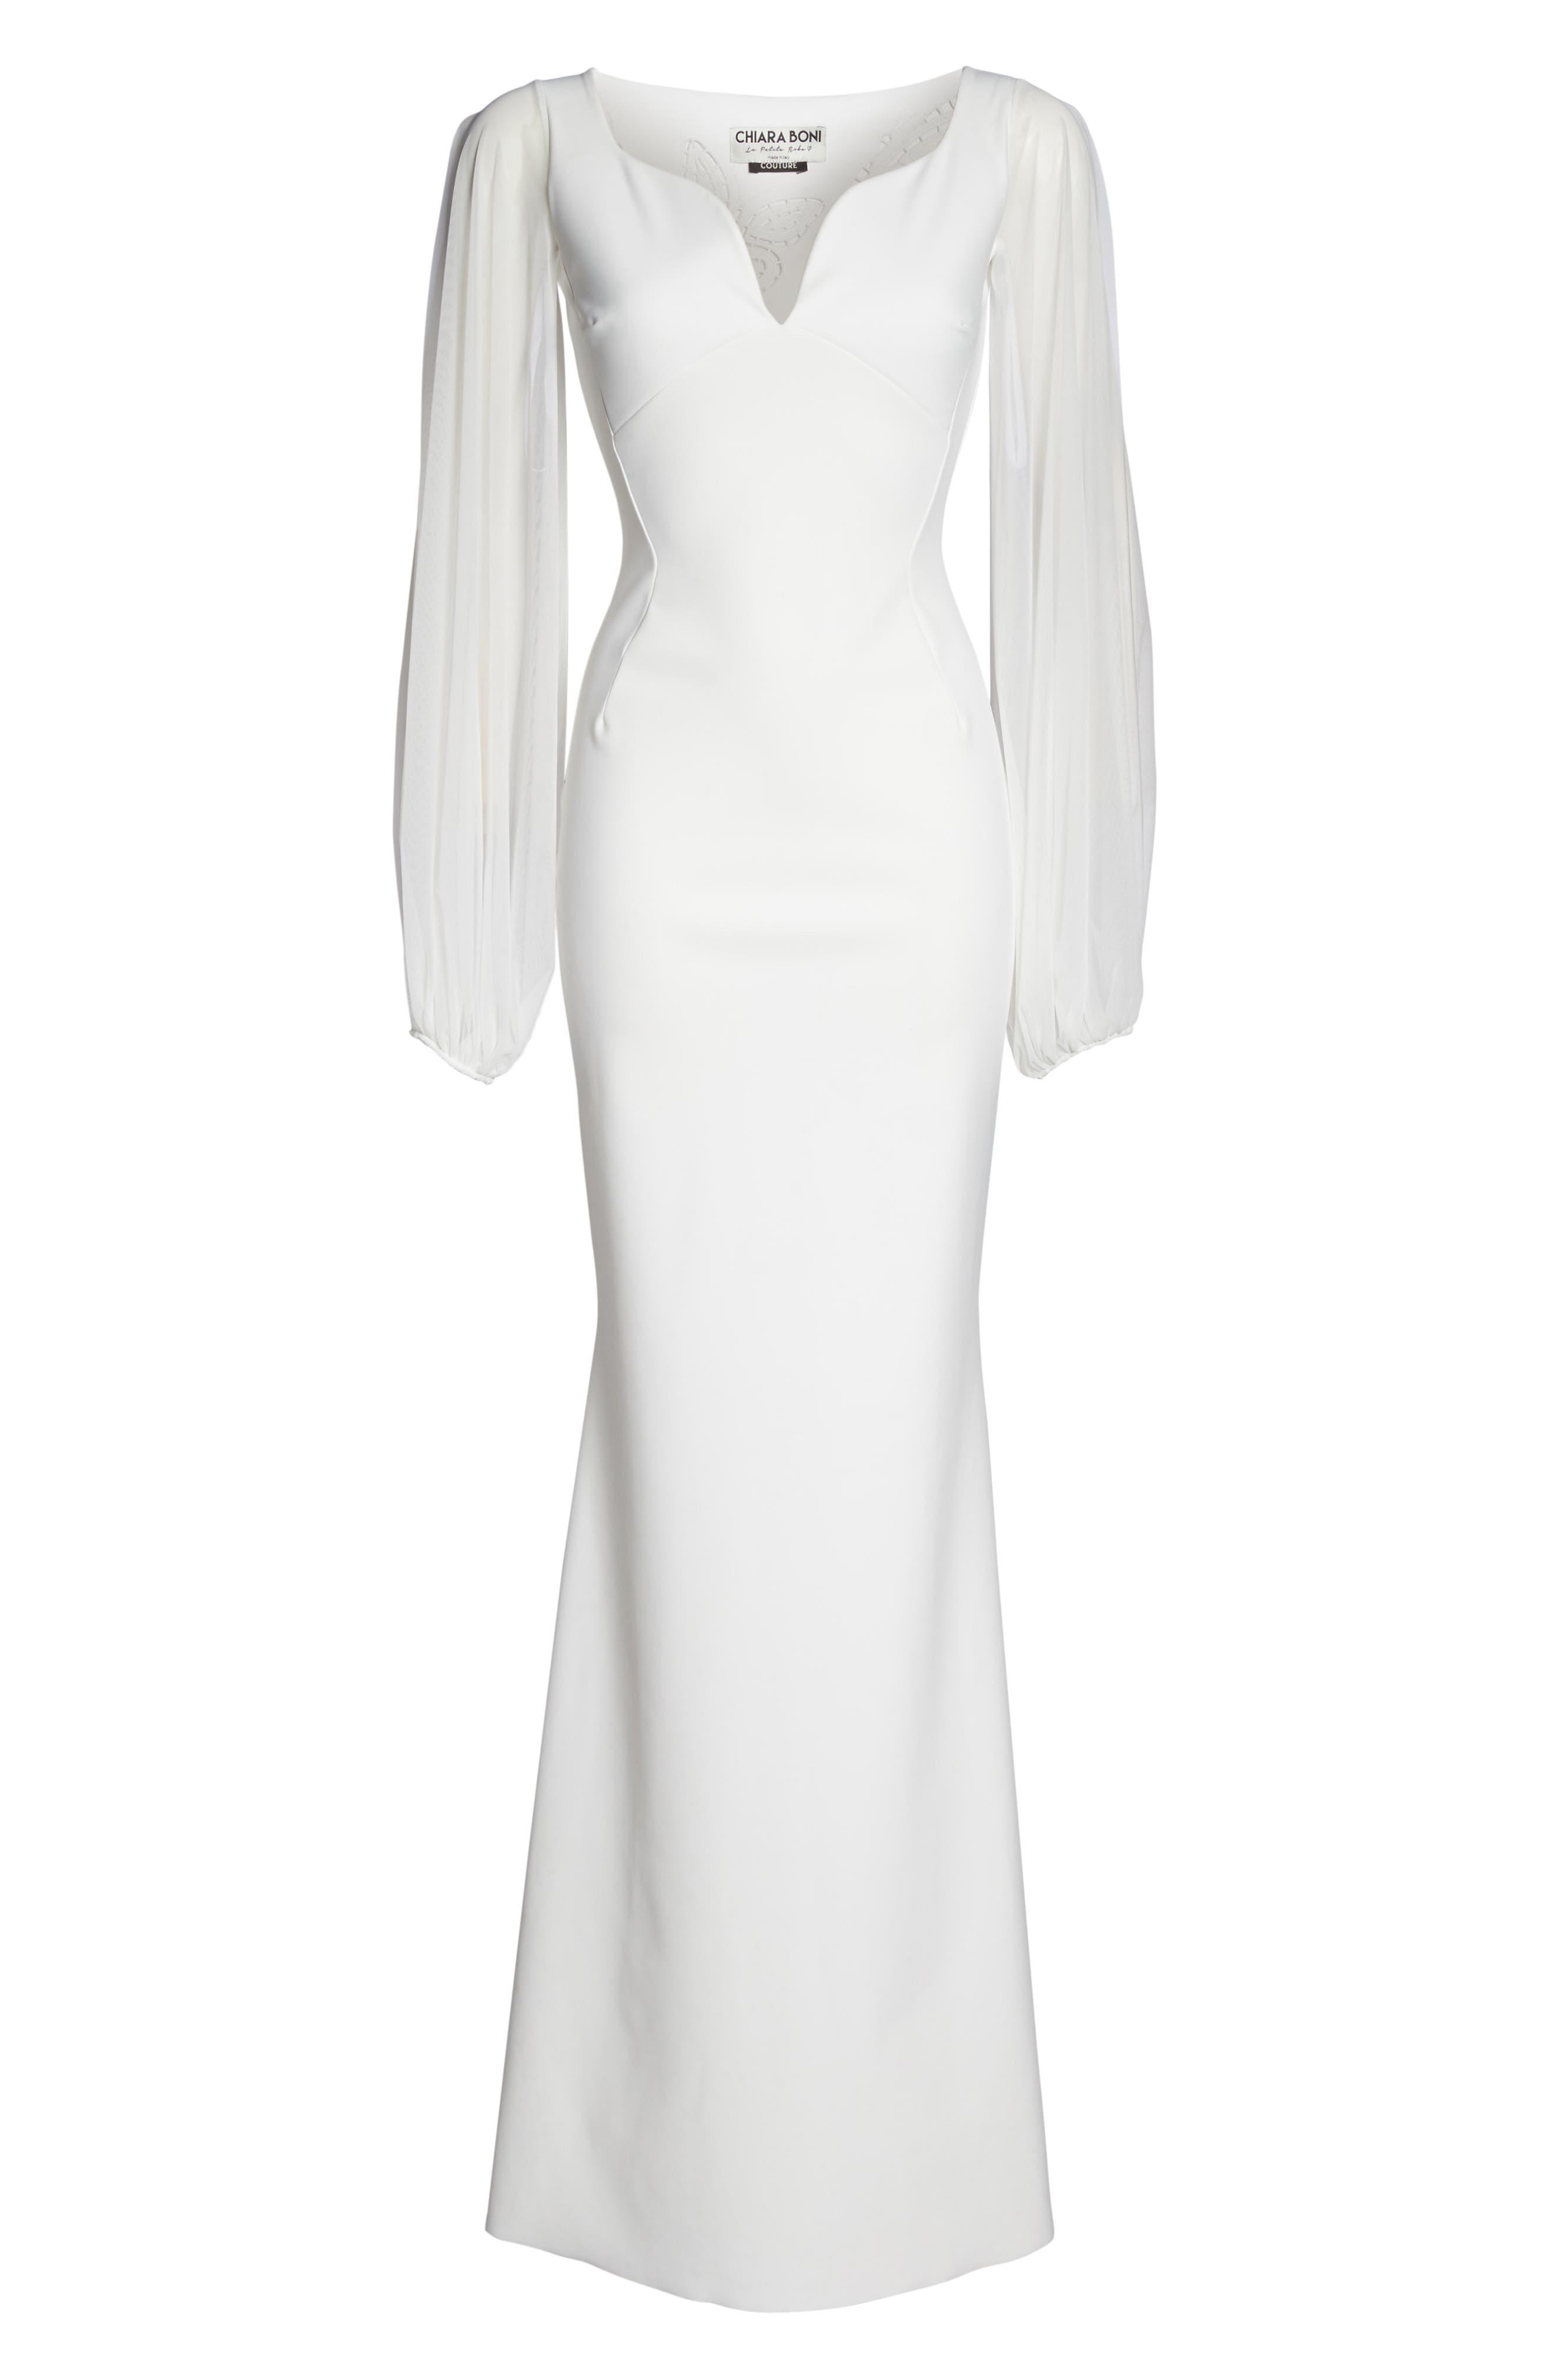 Dress Cutwork Back Gown,                             Alternate thumbnail 6, color,                             100